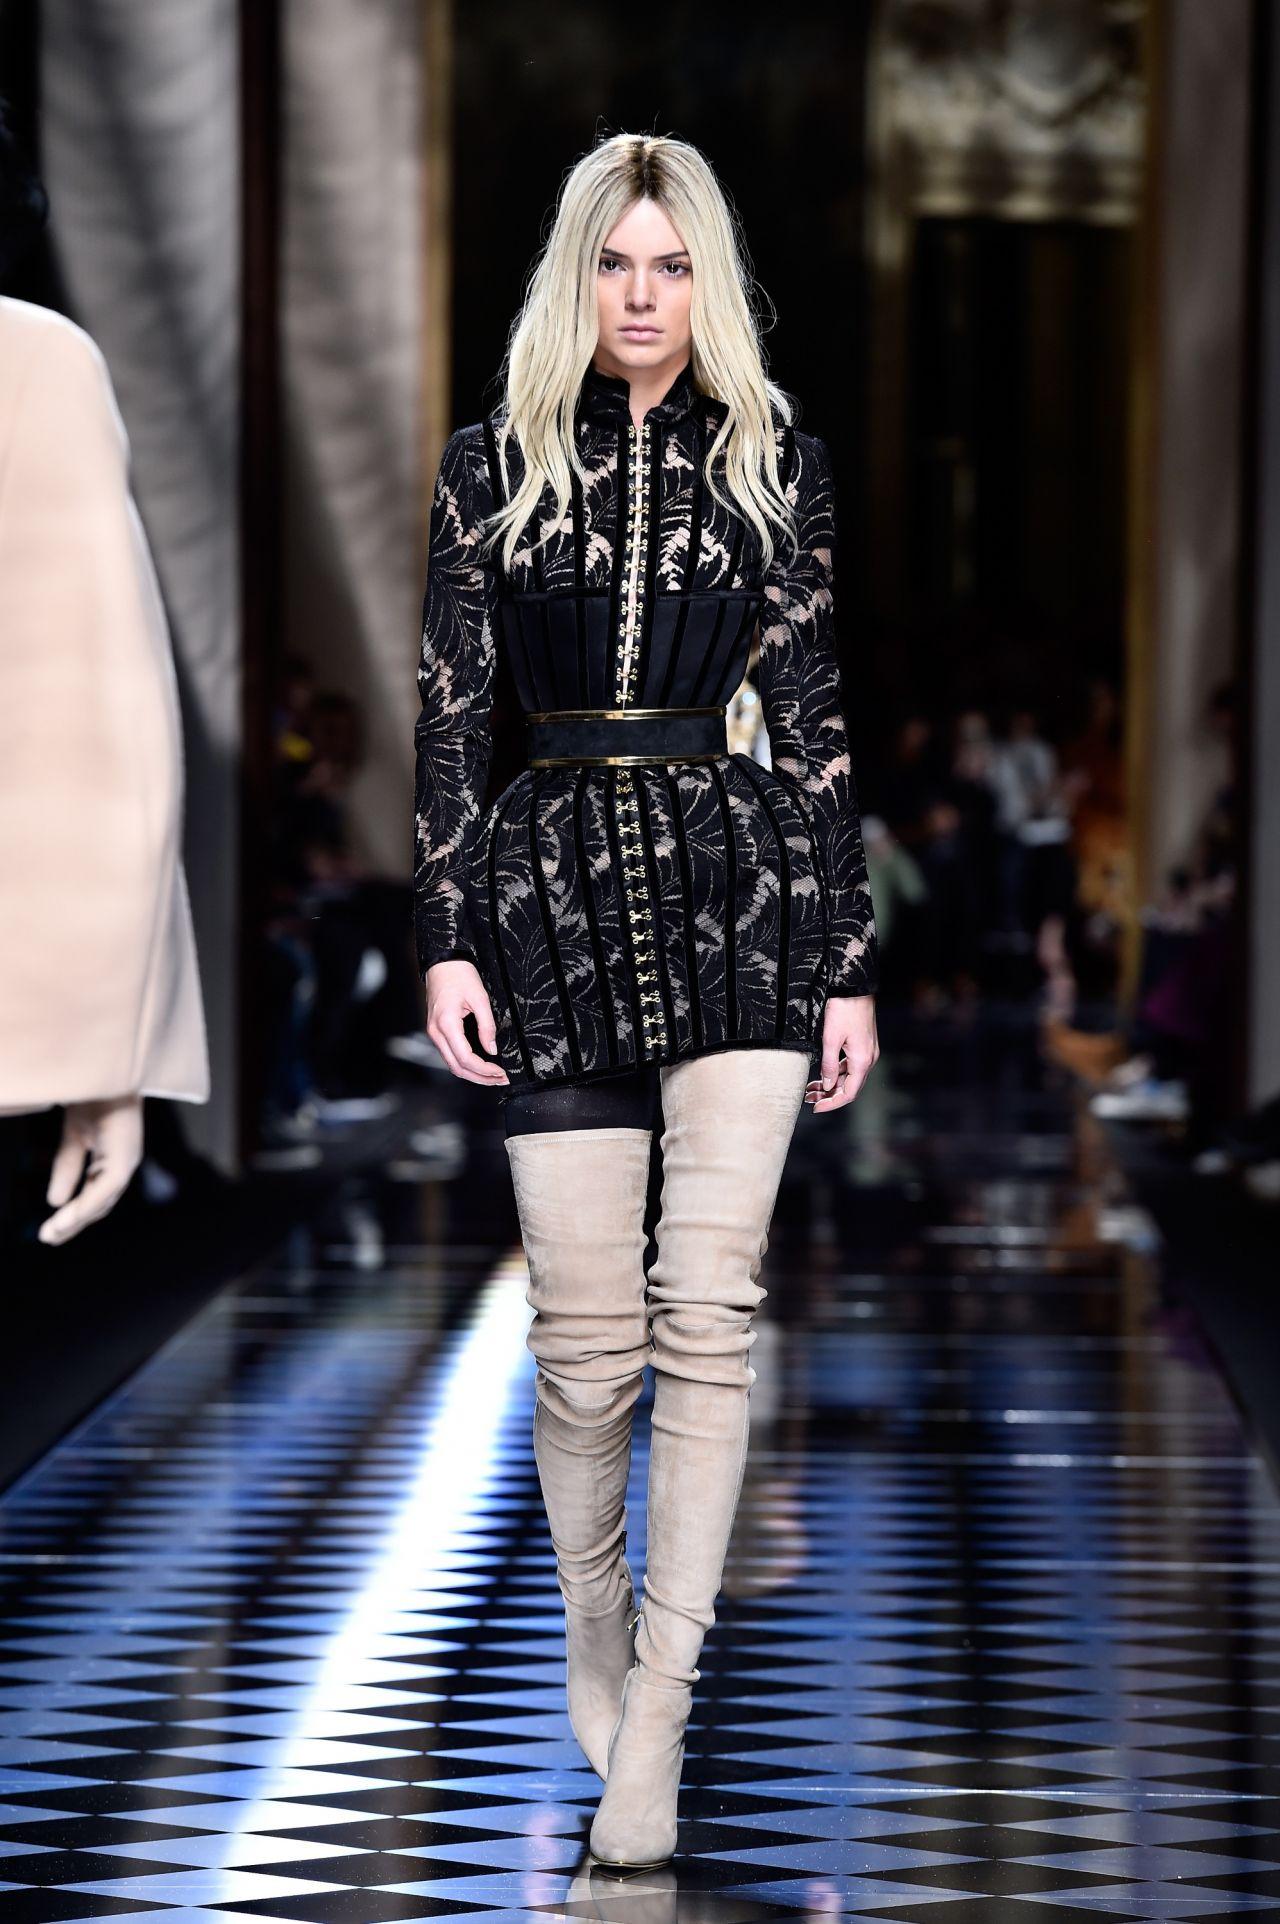 Kendall Jenner Balmain Fashion Show Paris Fashion Week